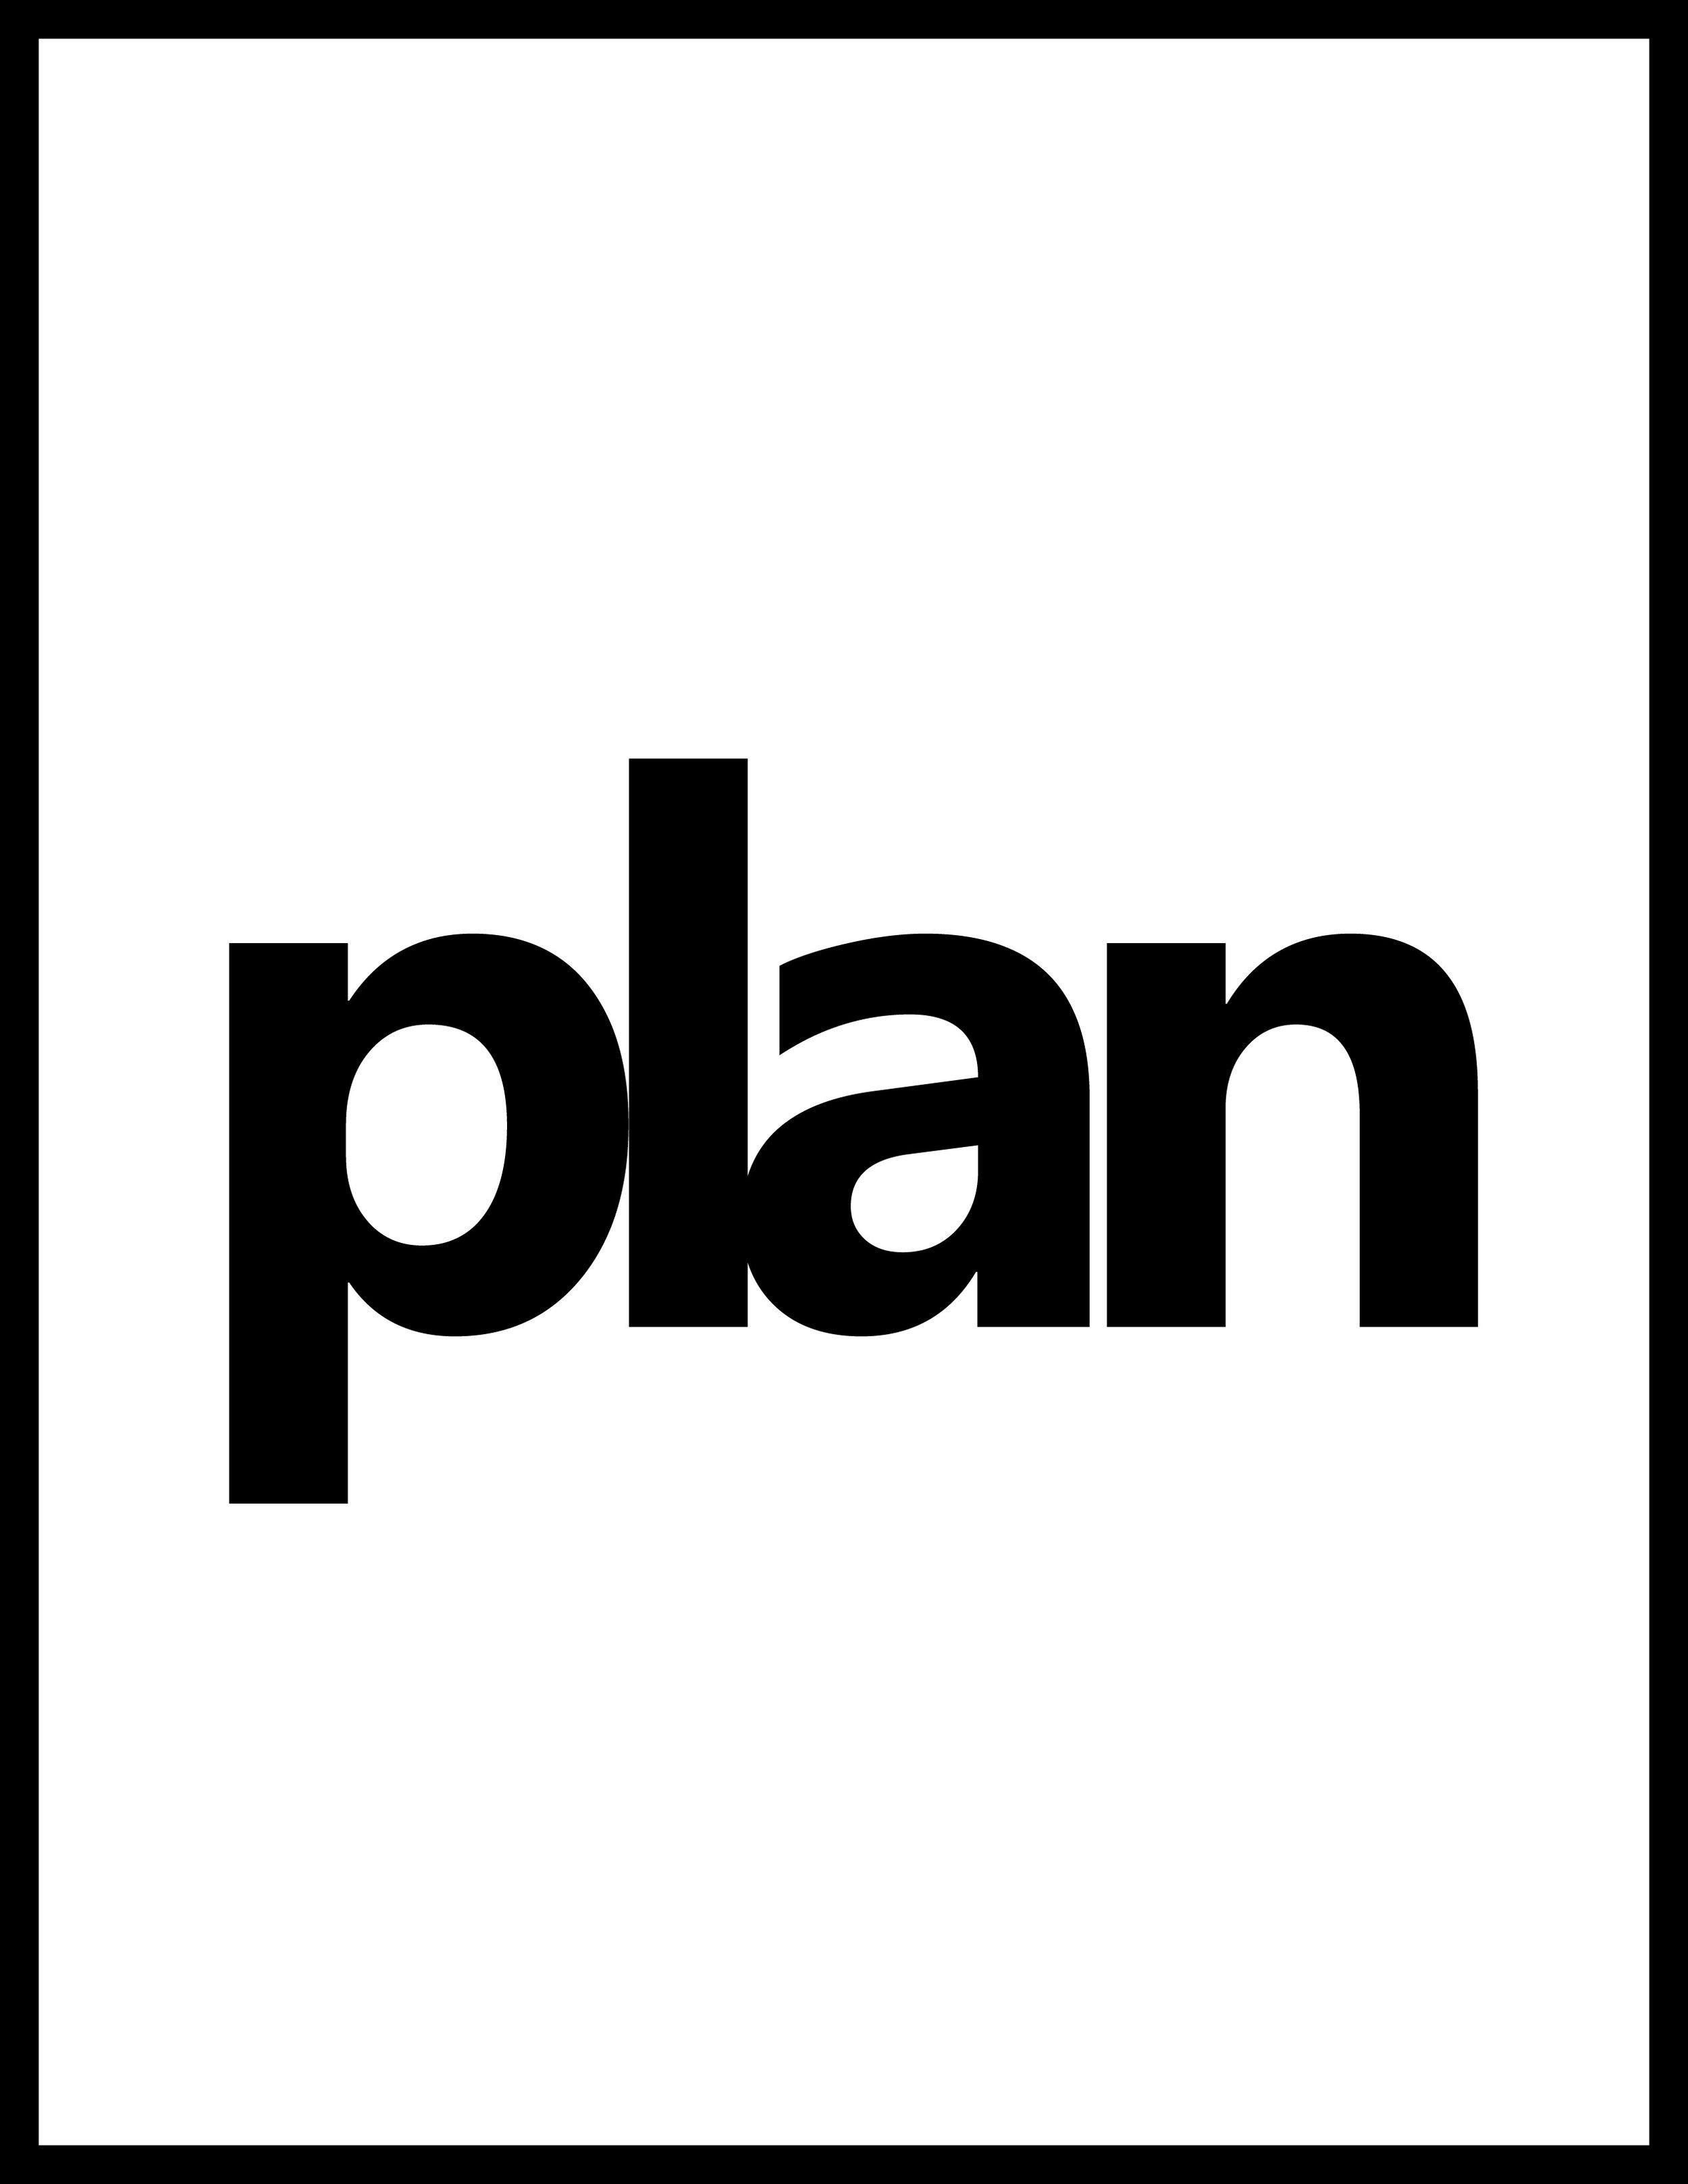 Plan Cover Image-01.jpg